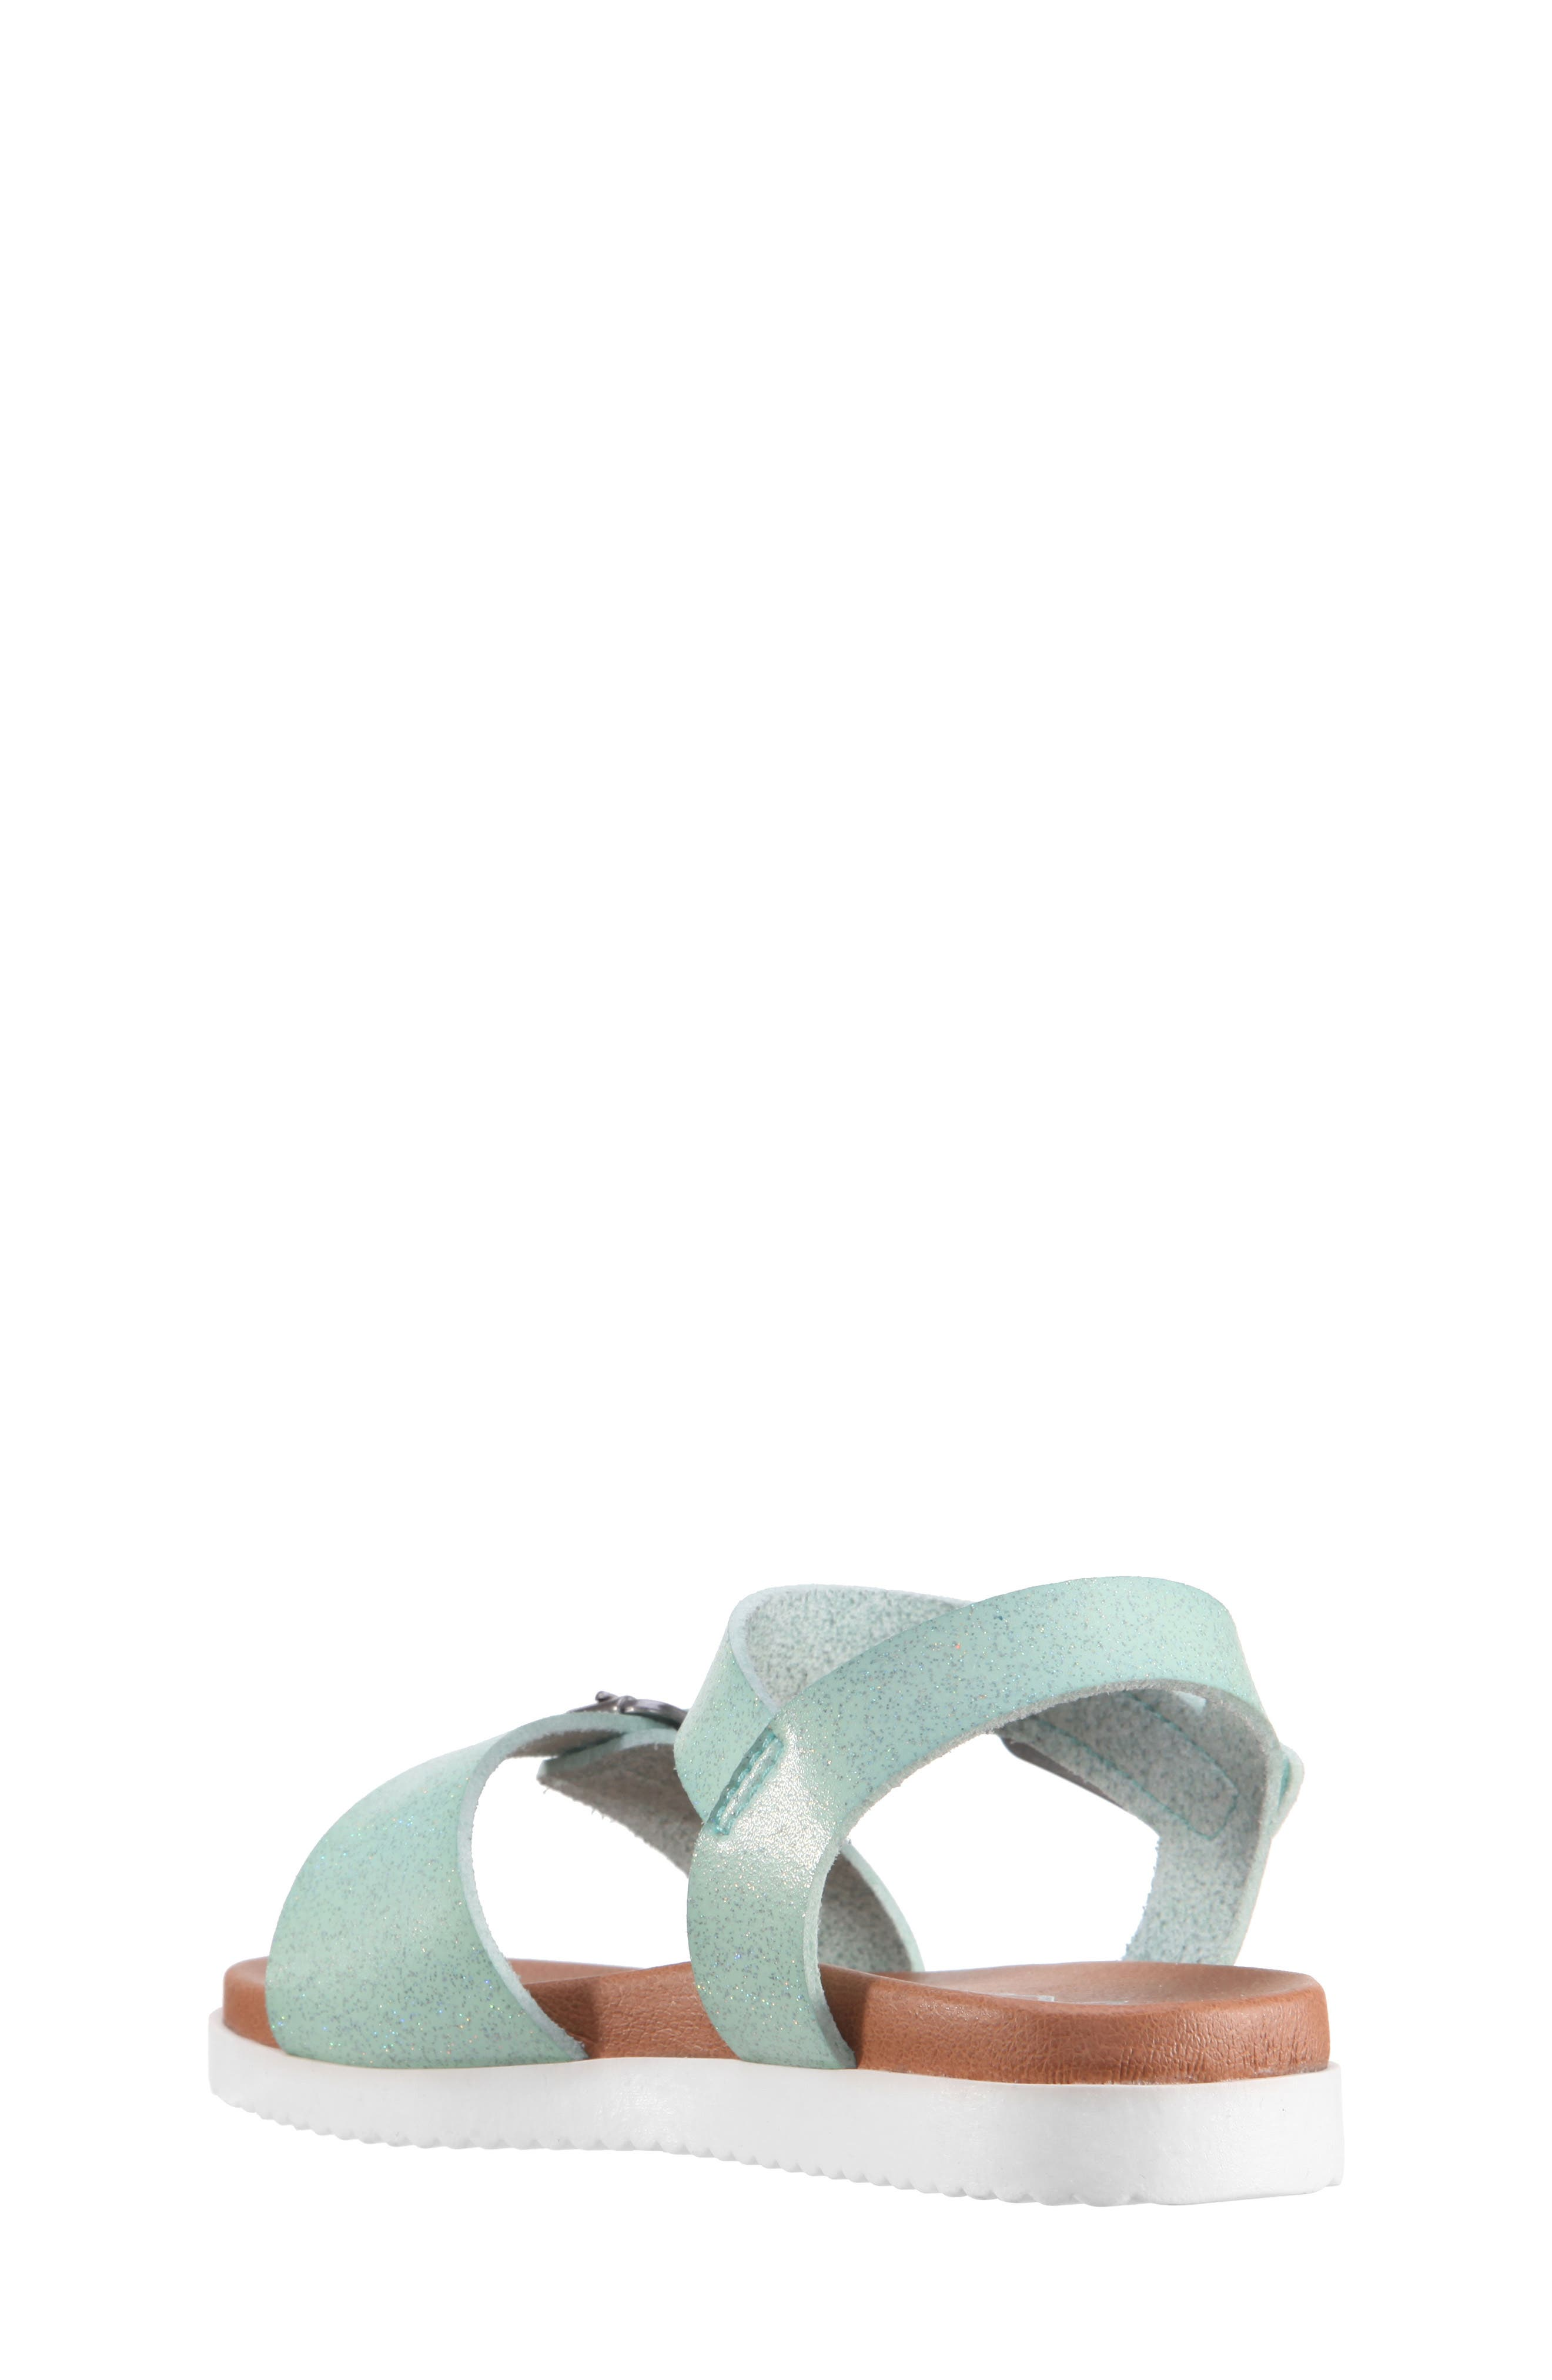 Jacklin3 Quarter Strap Sandal,                             Alternate thumbnail 2, color,                             Mint Dip Dye